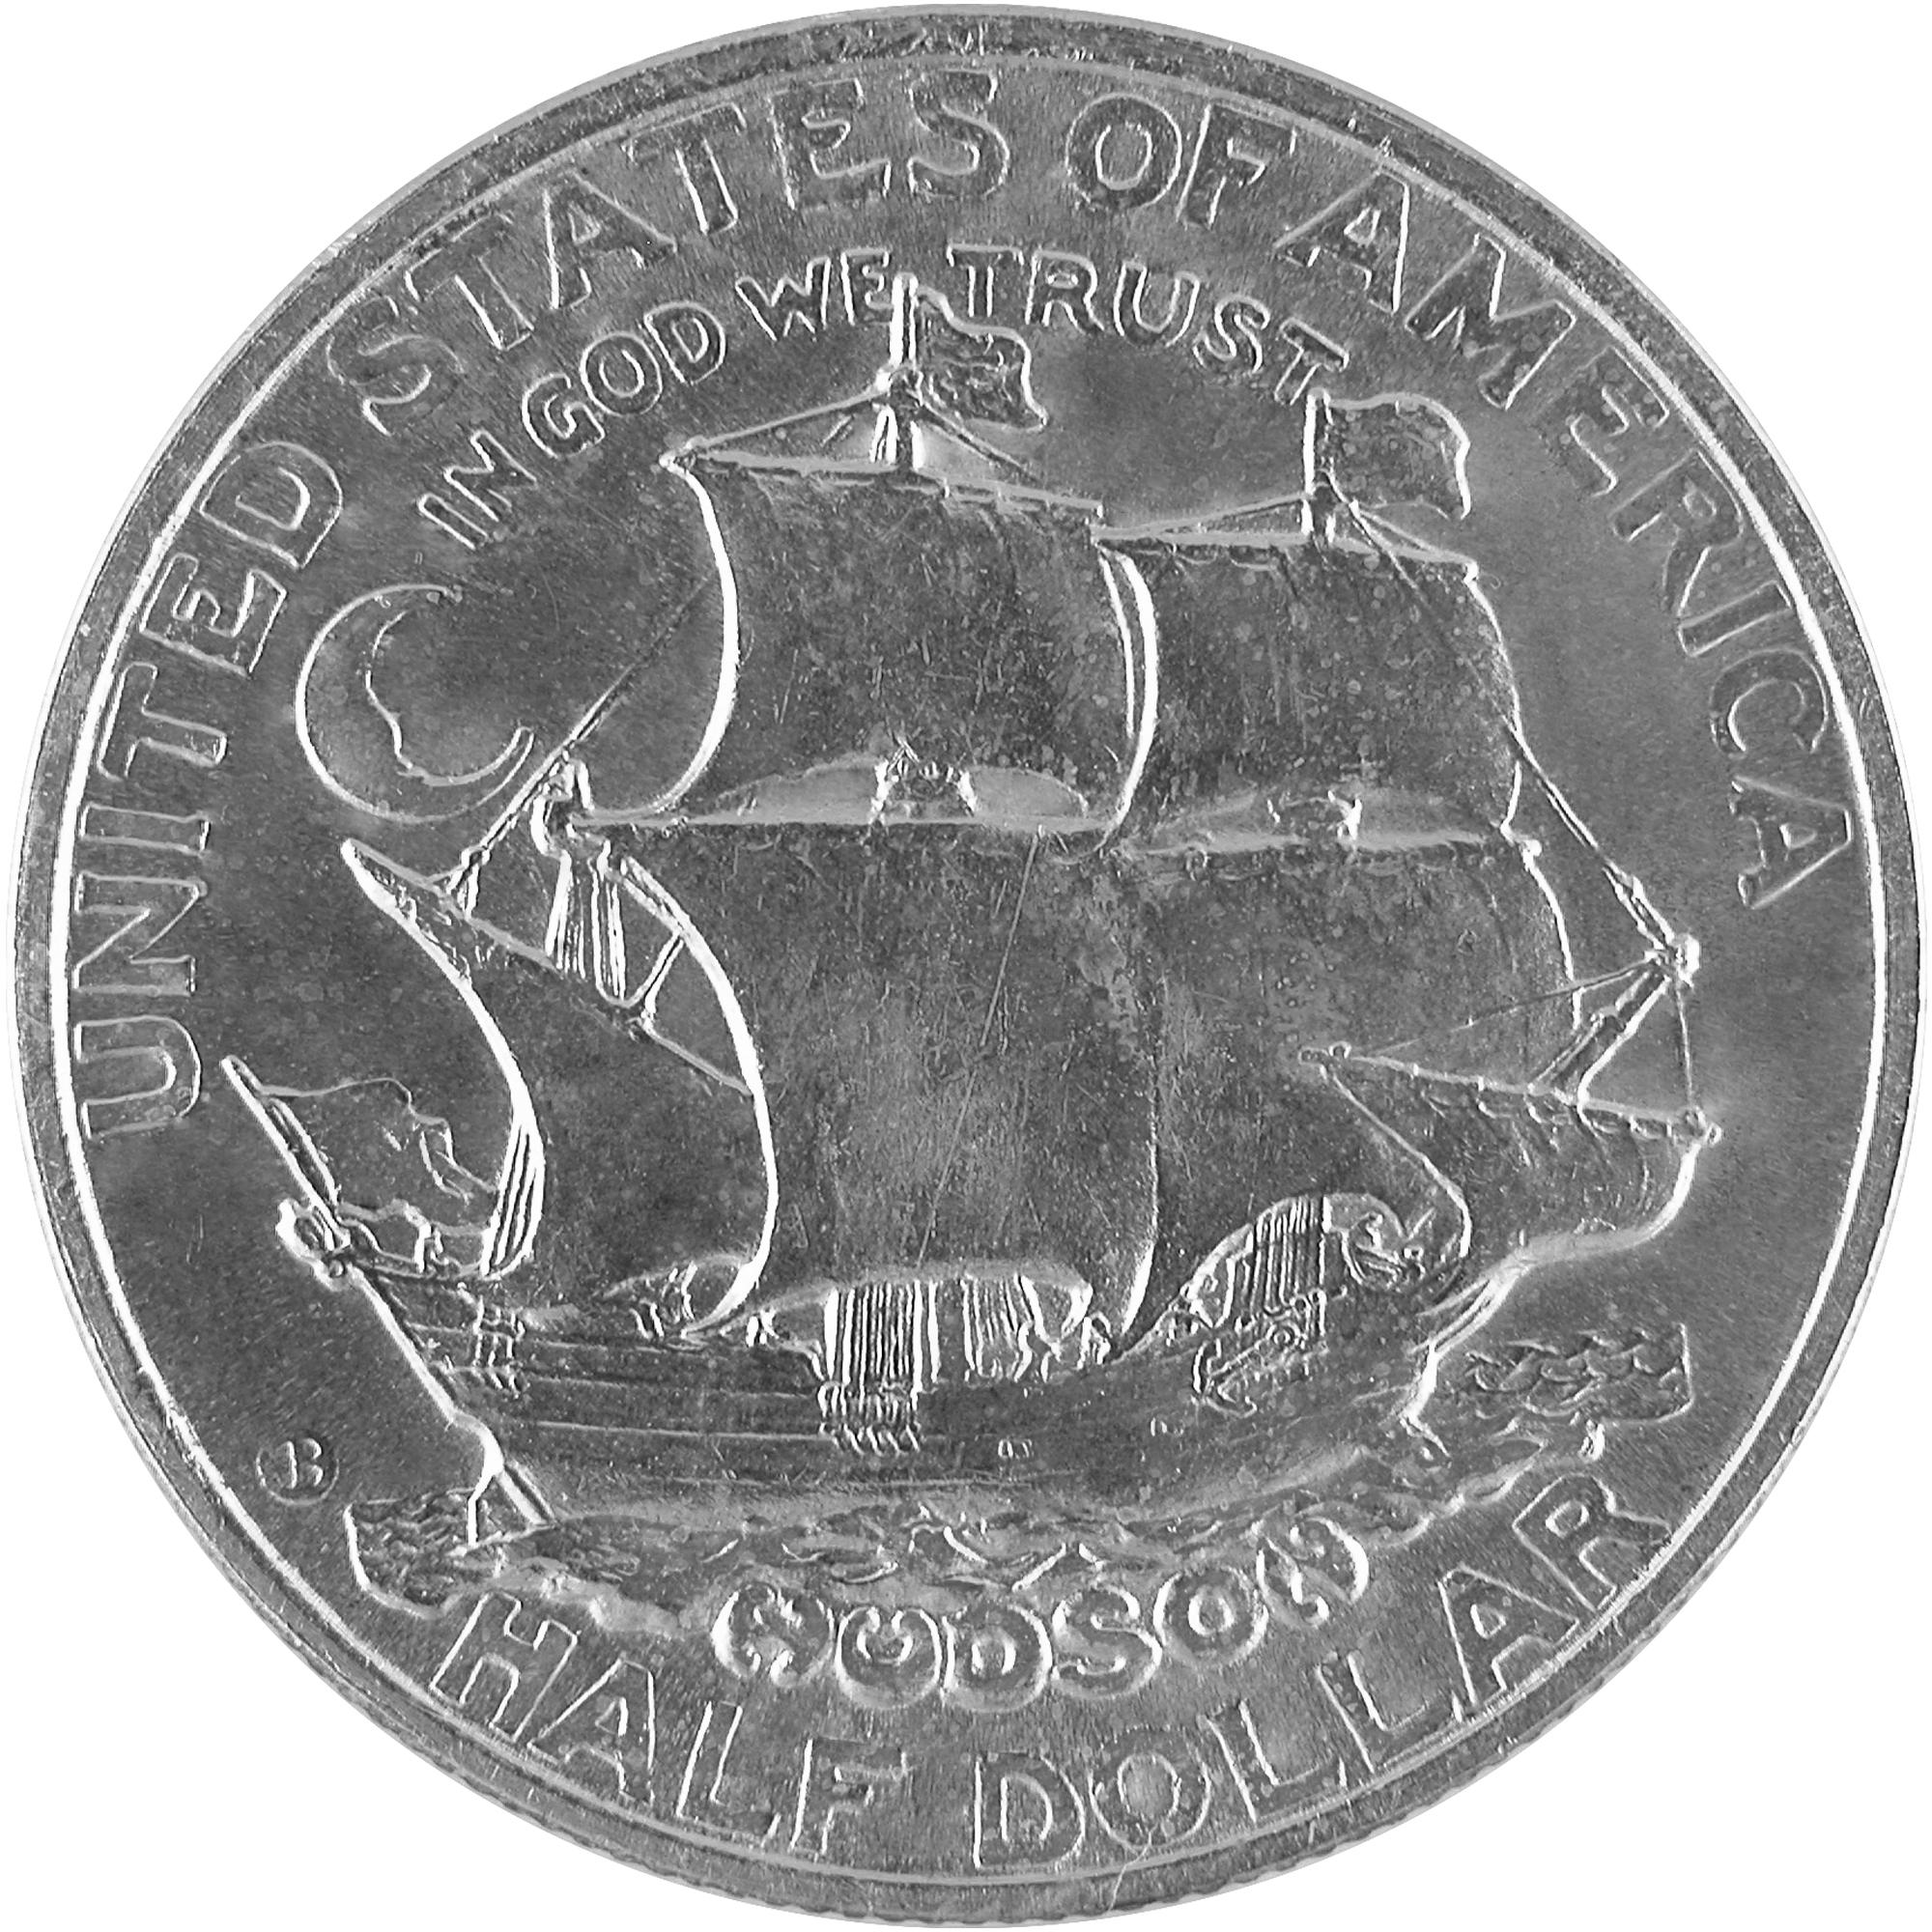 1935 Hudson New York Sesquicentennial Commemorative Silver Half Dollar Coin Reverse